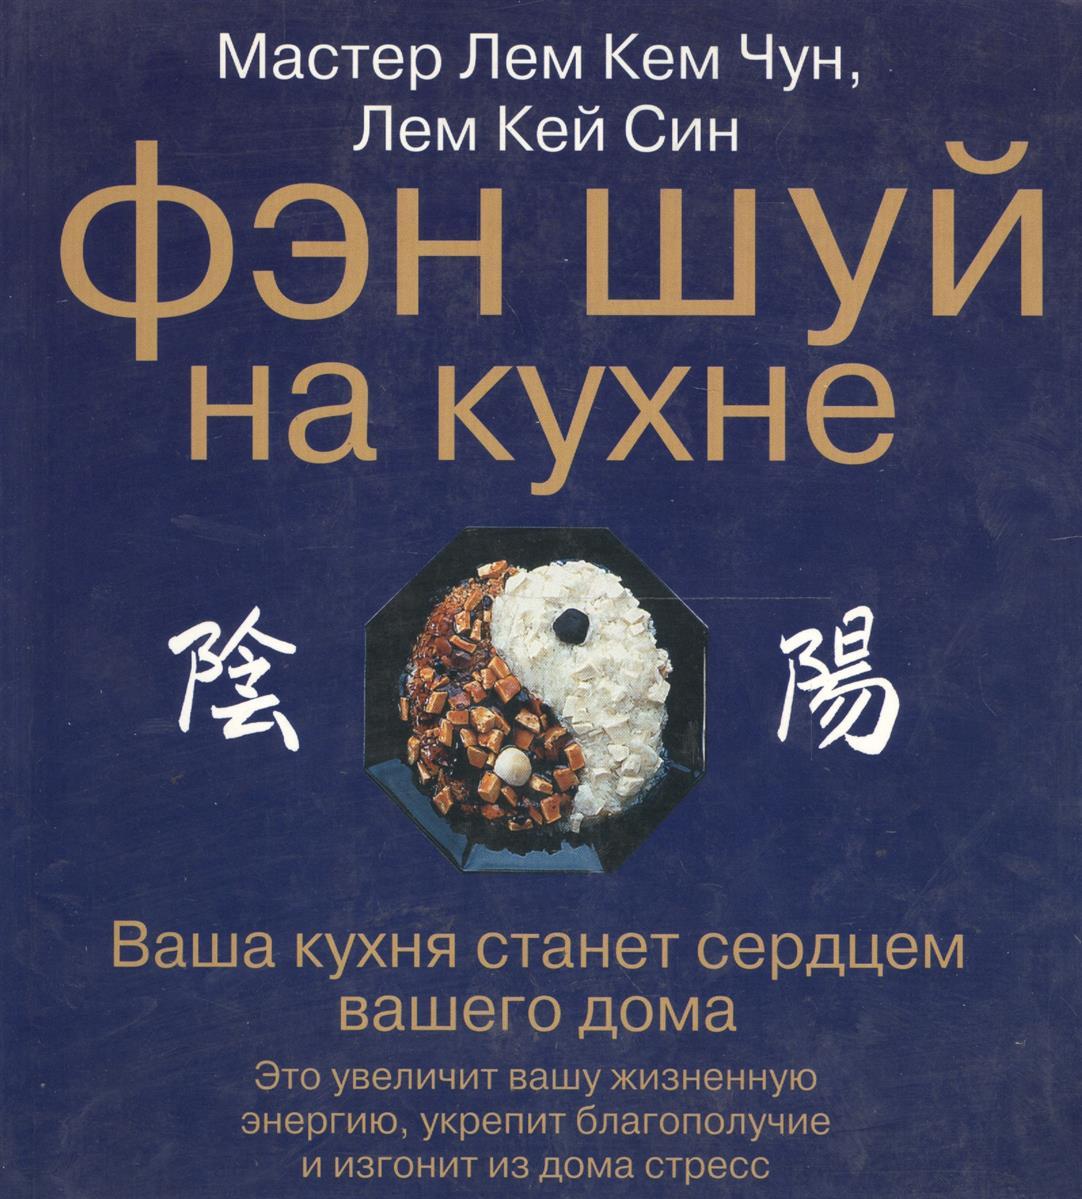 Лем Кем Чун, Лем Кей Син Фэн шуй на кухне